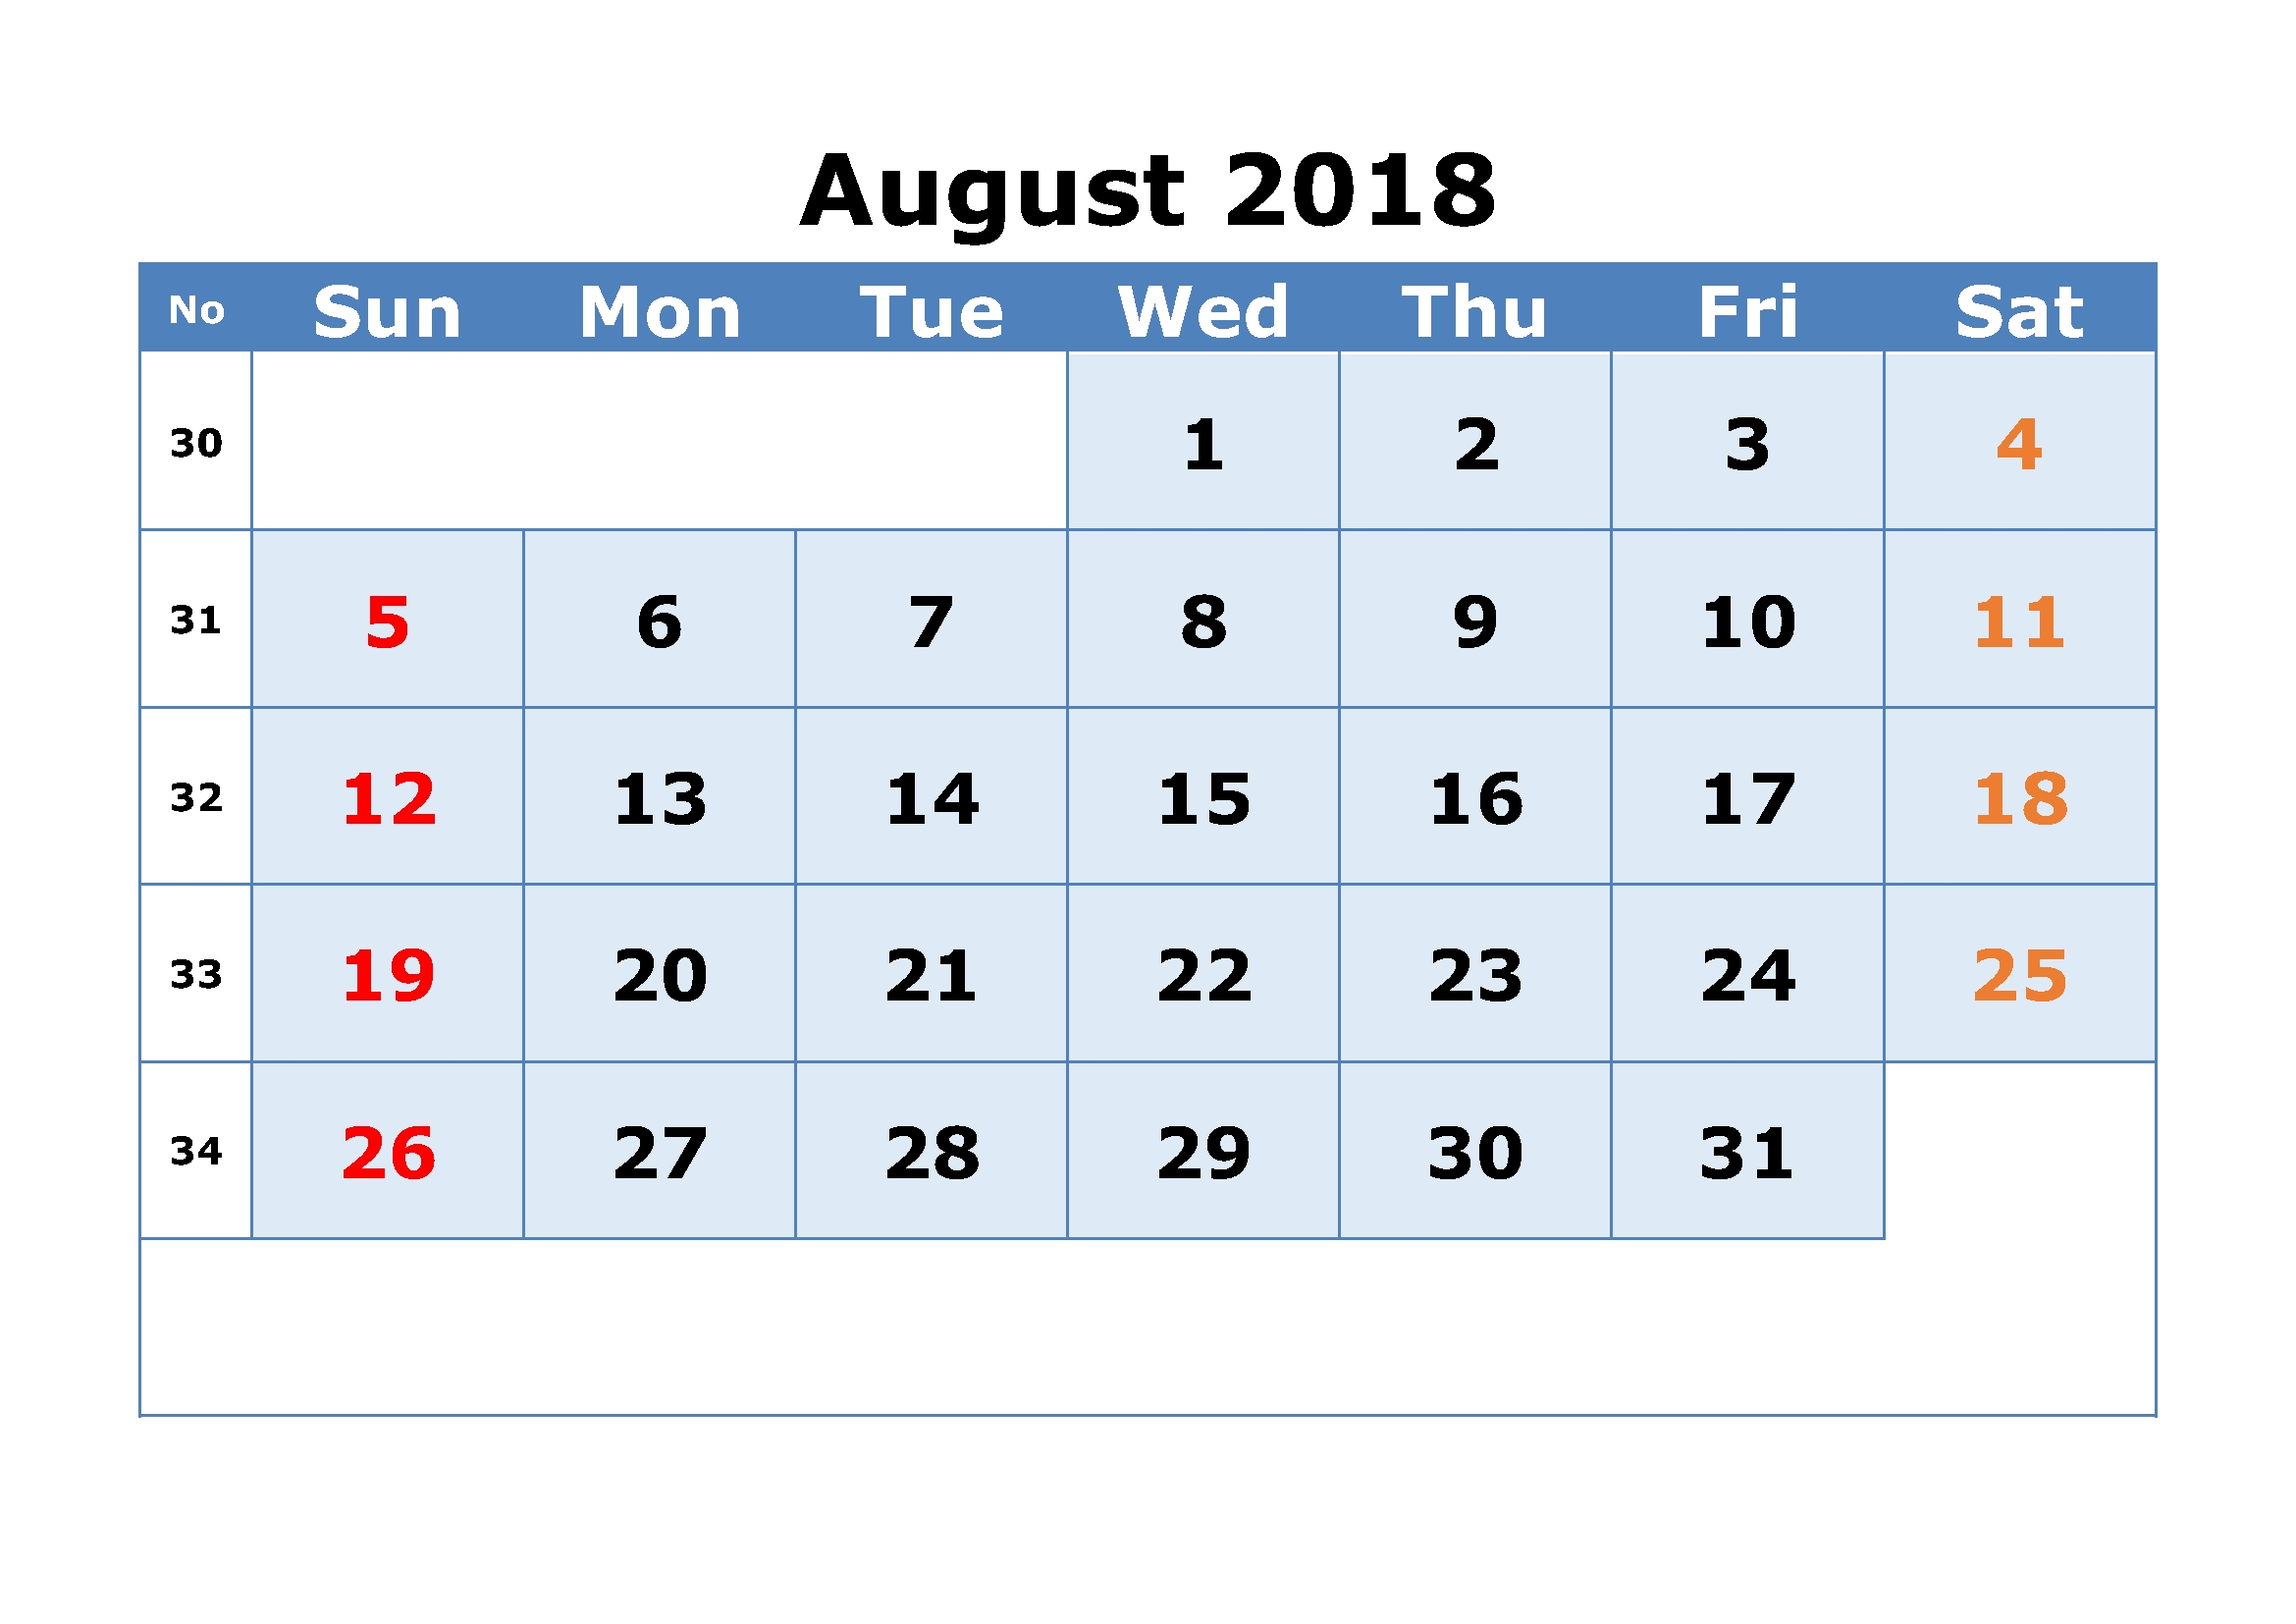 printable calendar august 2018 free printable calendar template Calendar August 2018 Printable Free erdferdf